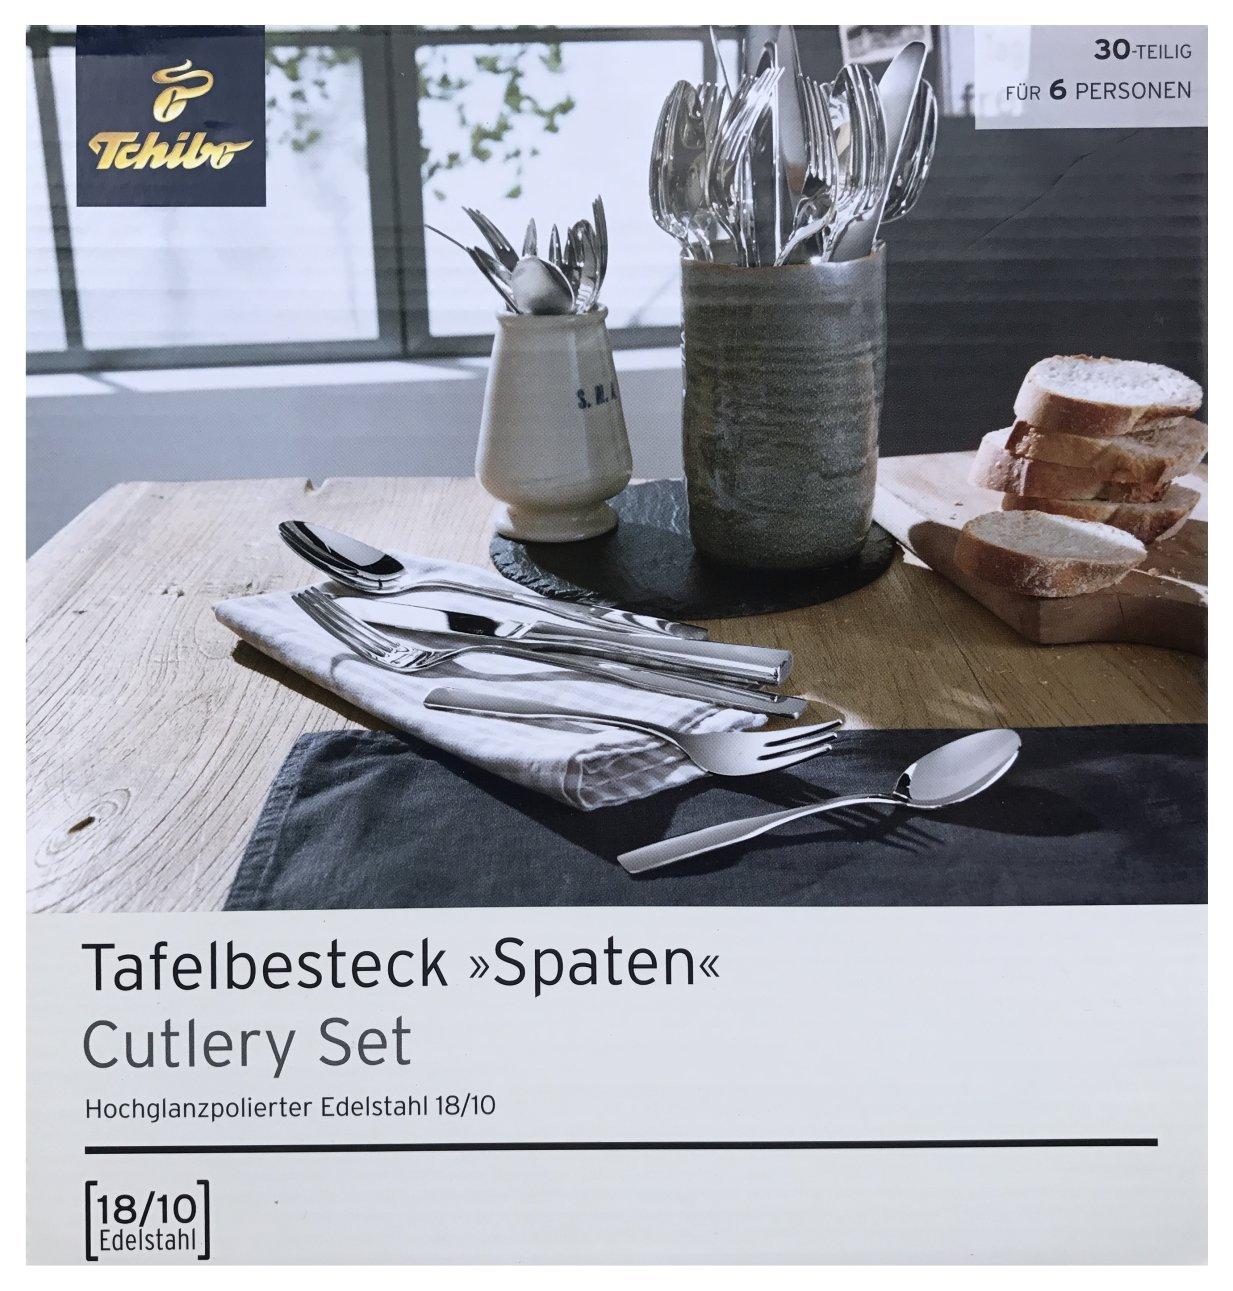 TCM Tchibo Tafelbesteck Besteck Set Essbesteck 30 tlg.6 Personen Edelstahl 18/10